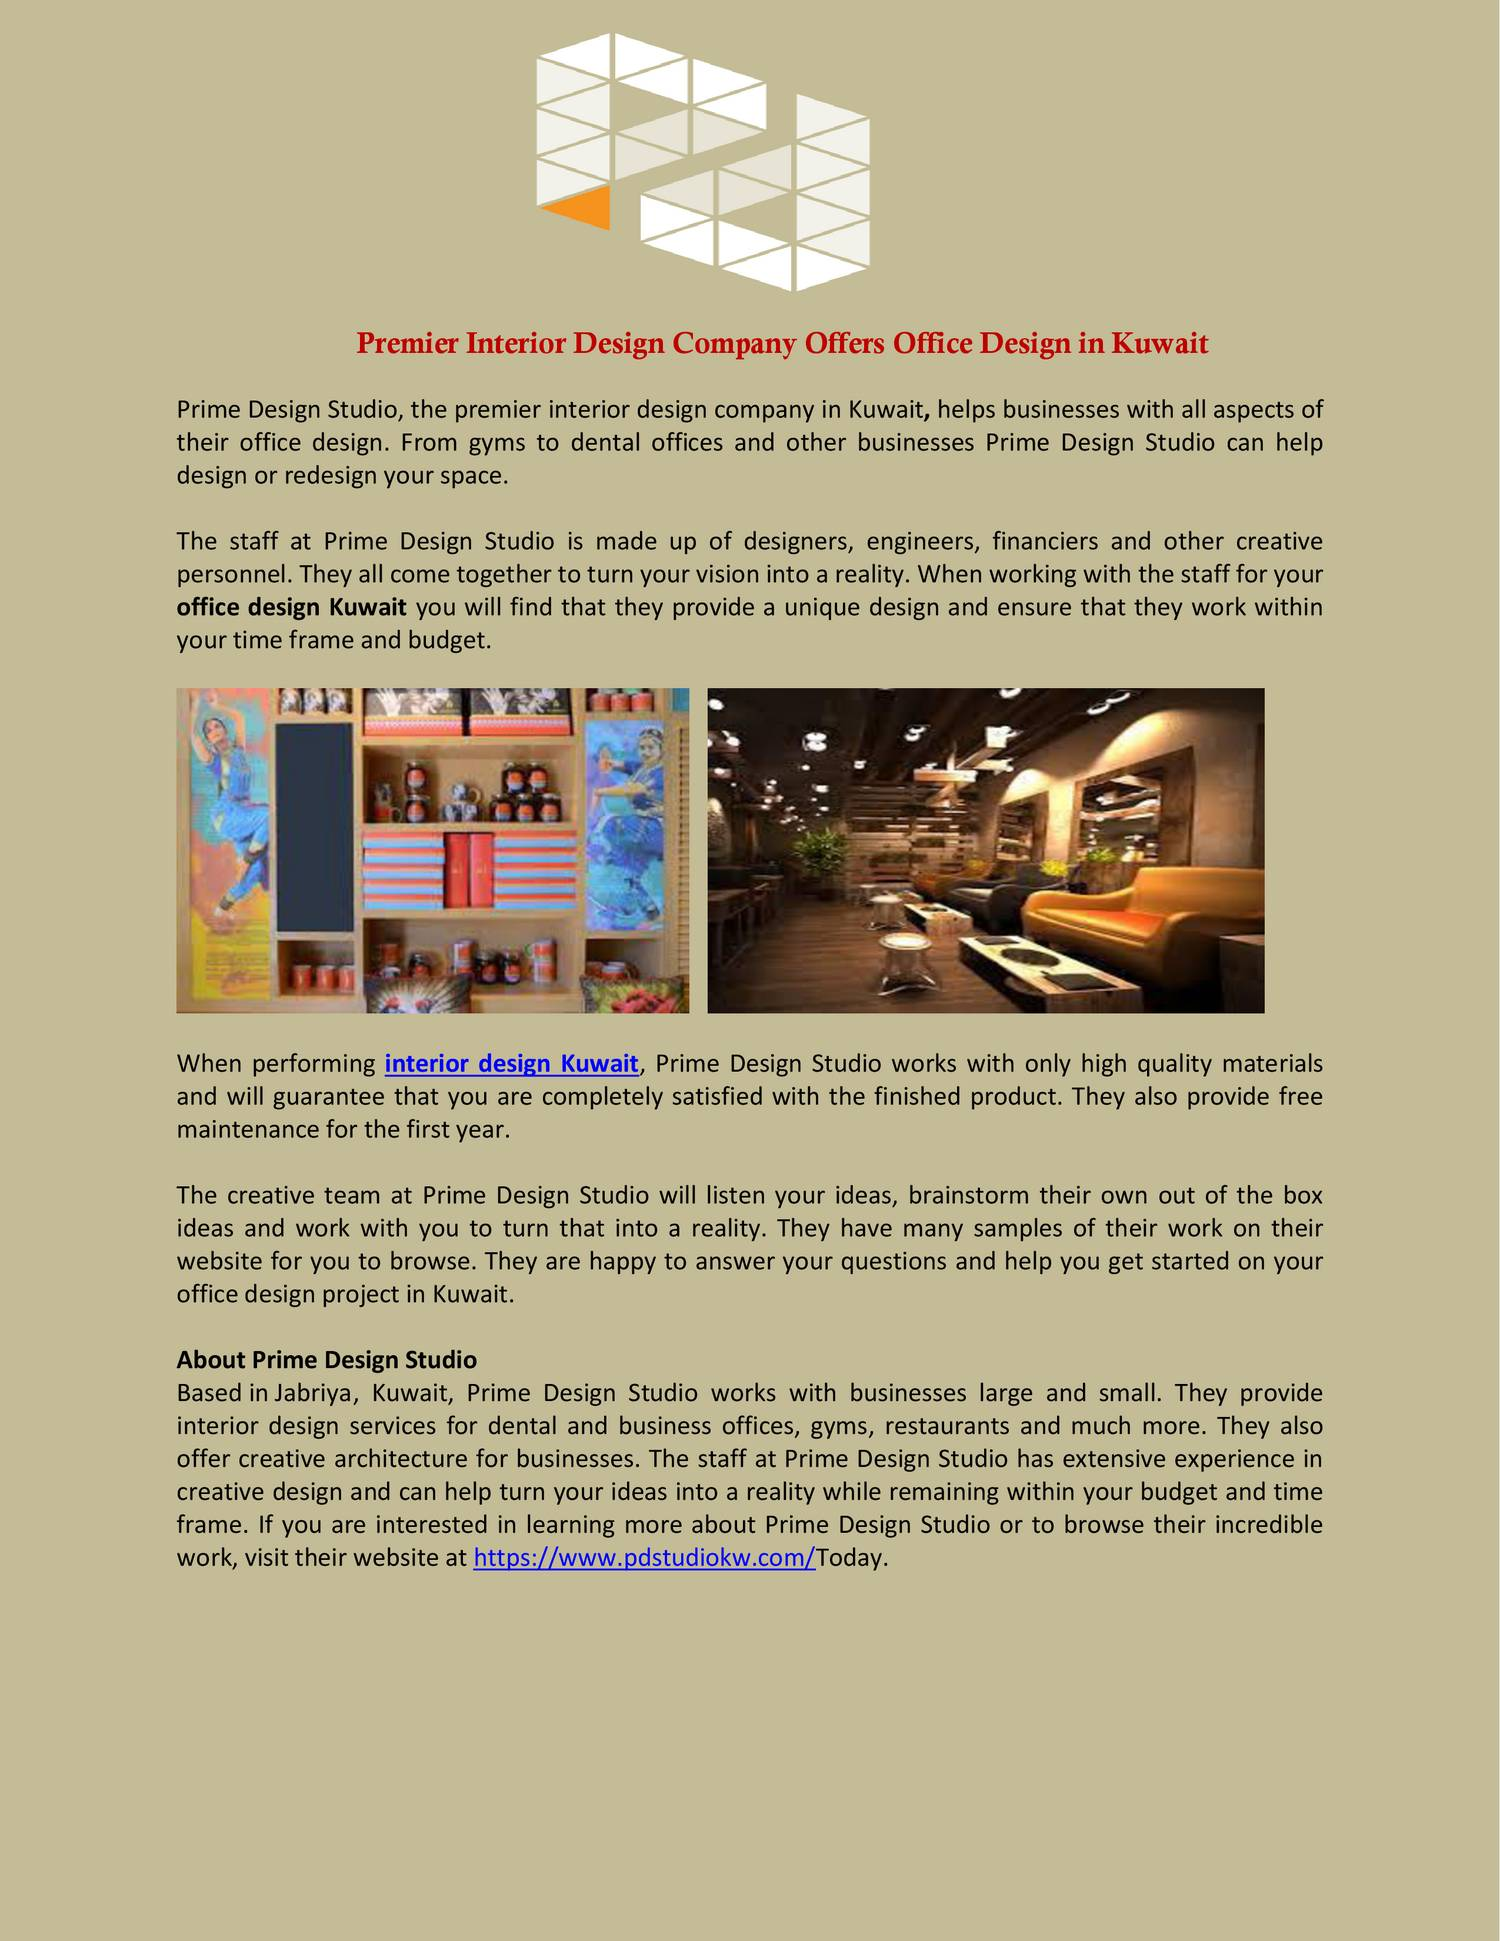 Premier Interior Design Company Offers Office Design in Kuwait pdf